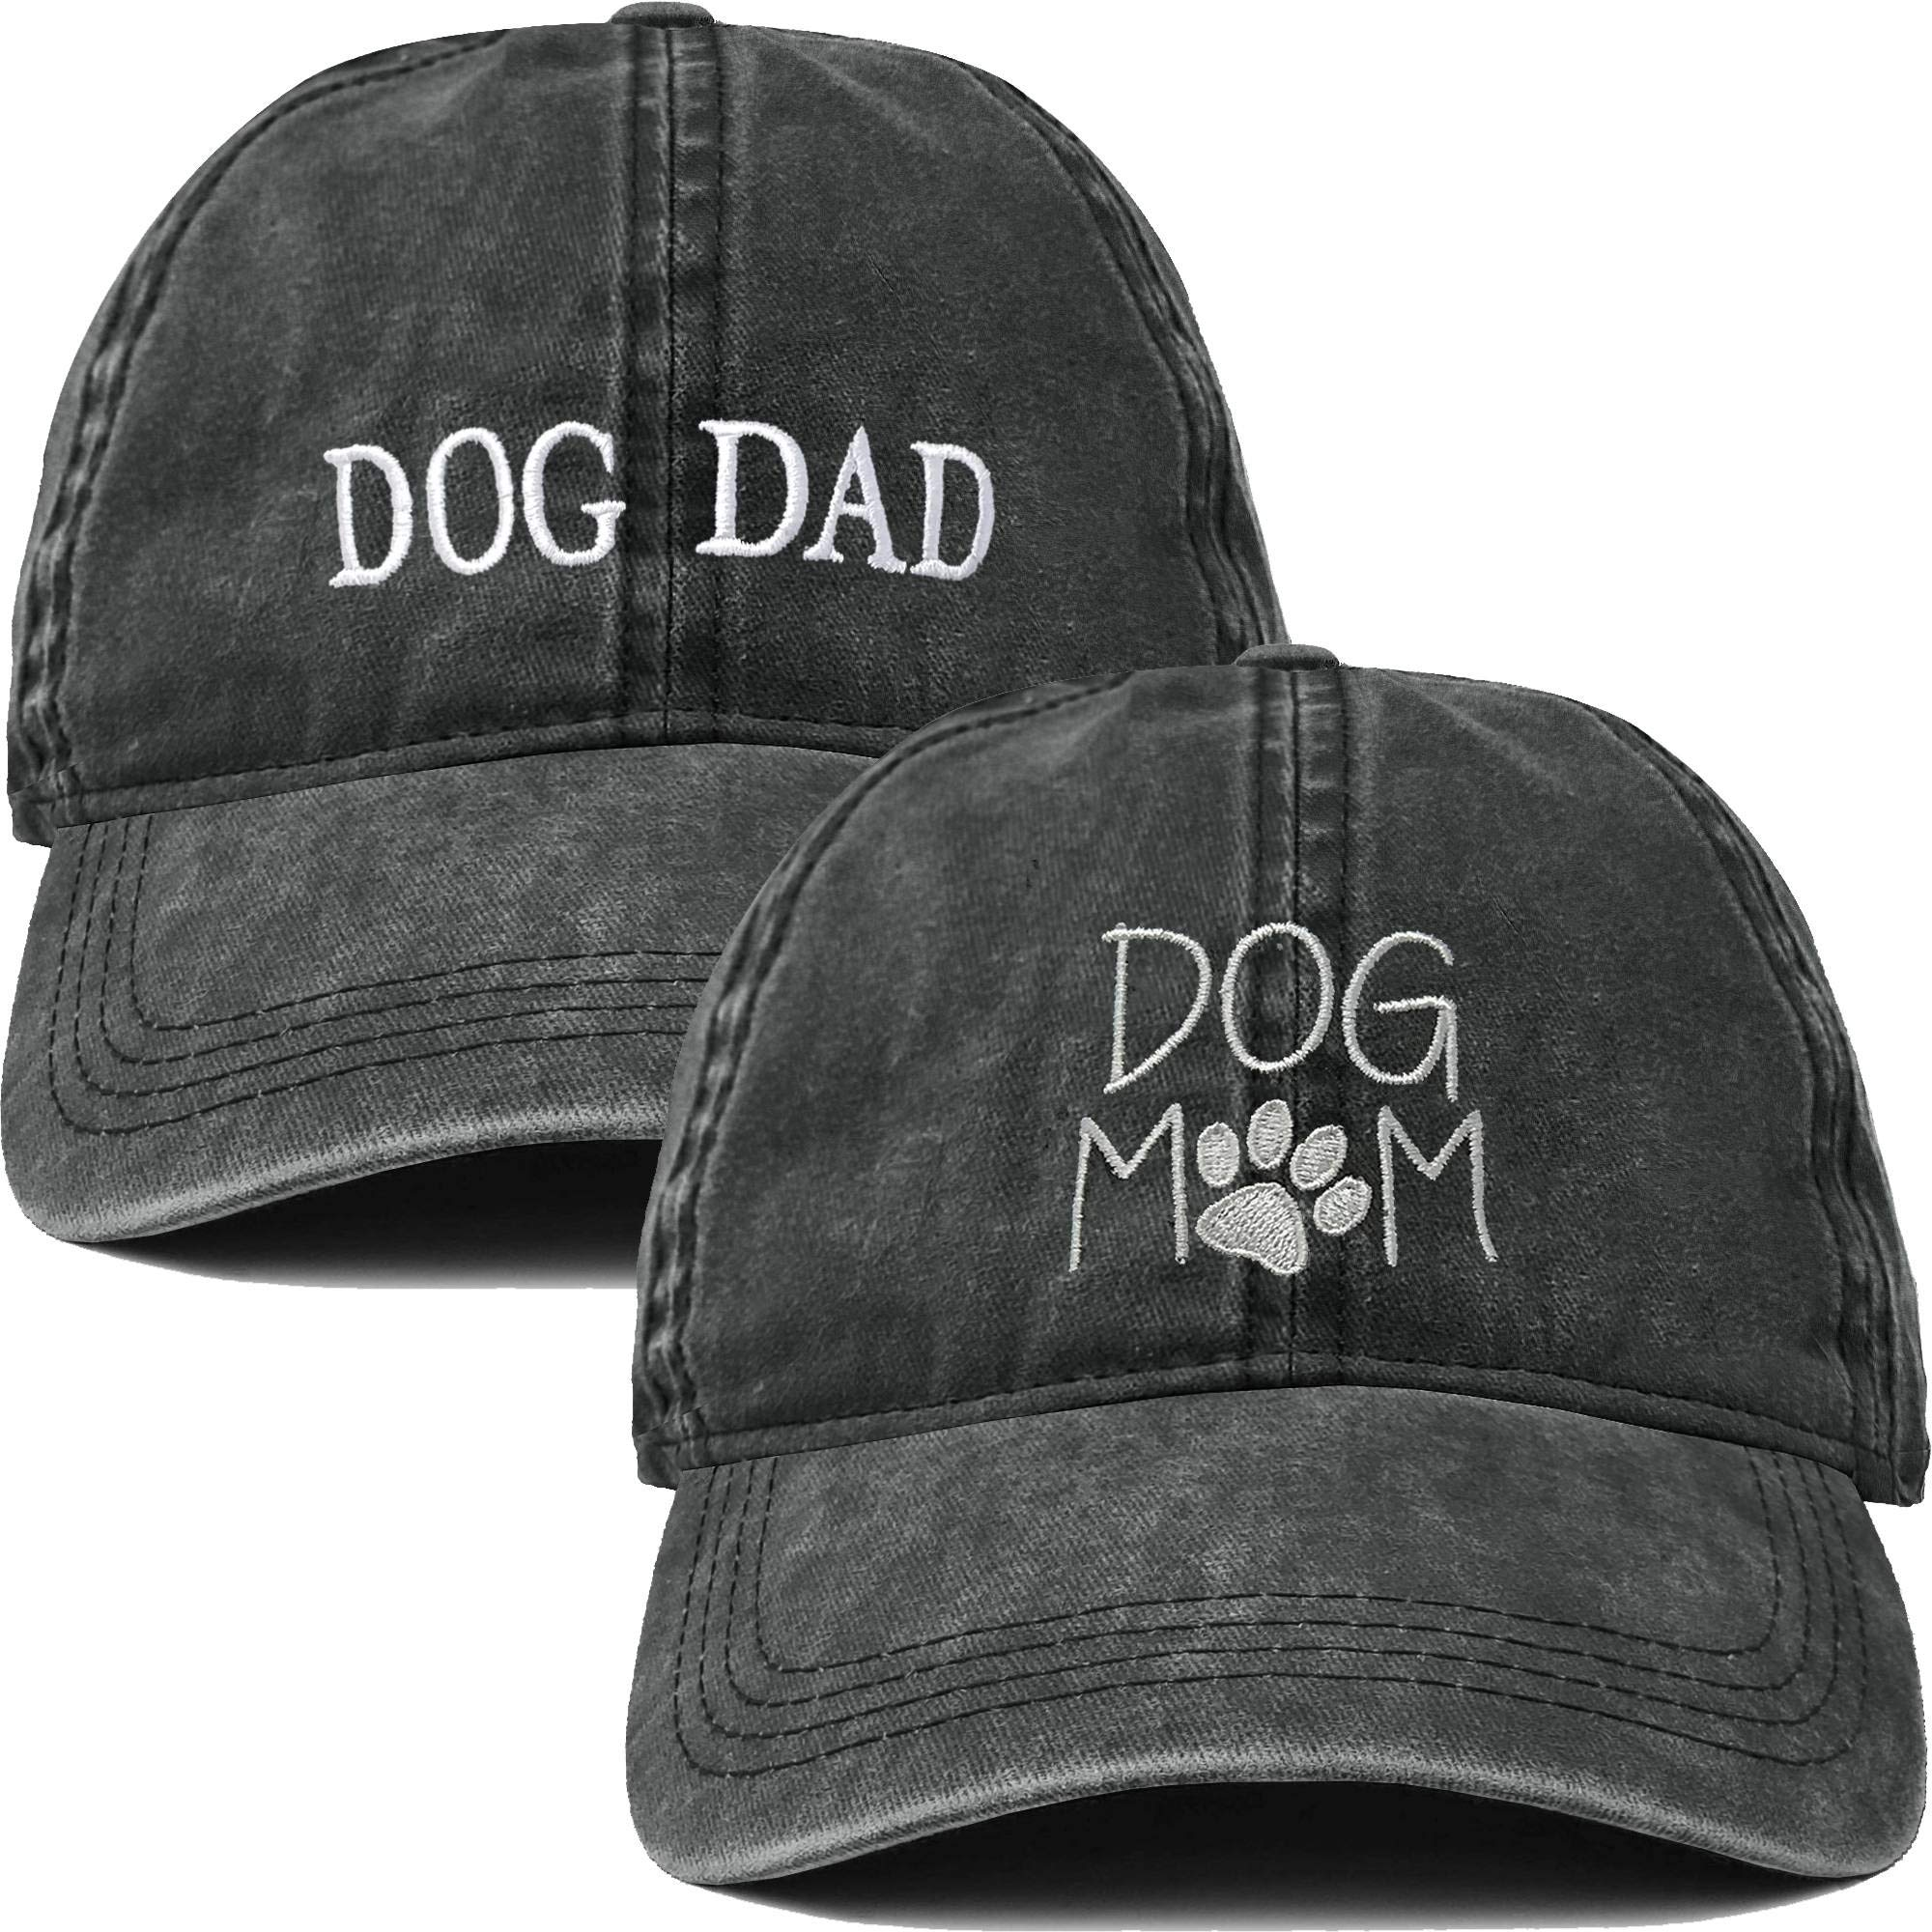 H-214-2-DMD06-W Dog Mom and Dog Dad Hat Bundle - Washed